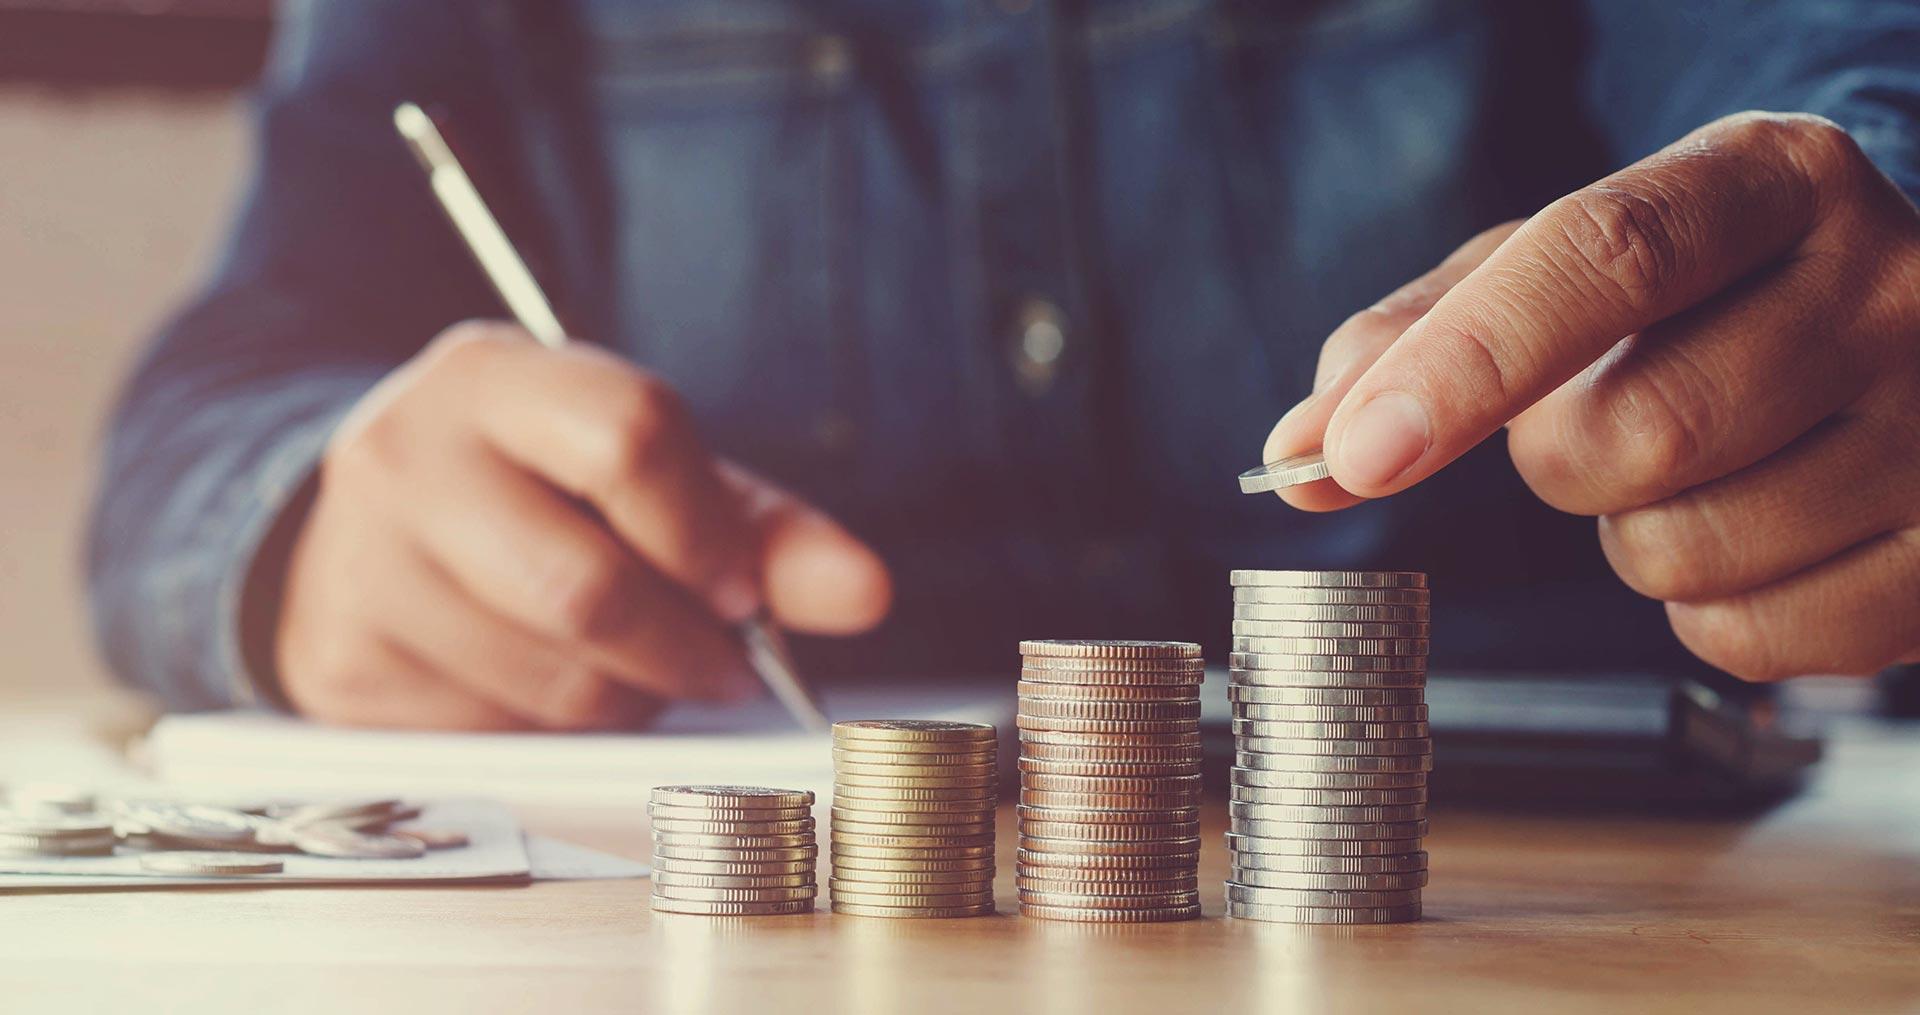 Como construir riqueza sem perder qualidade de vida